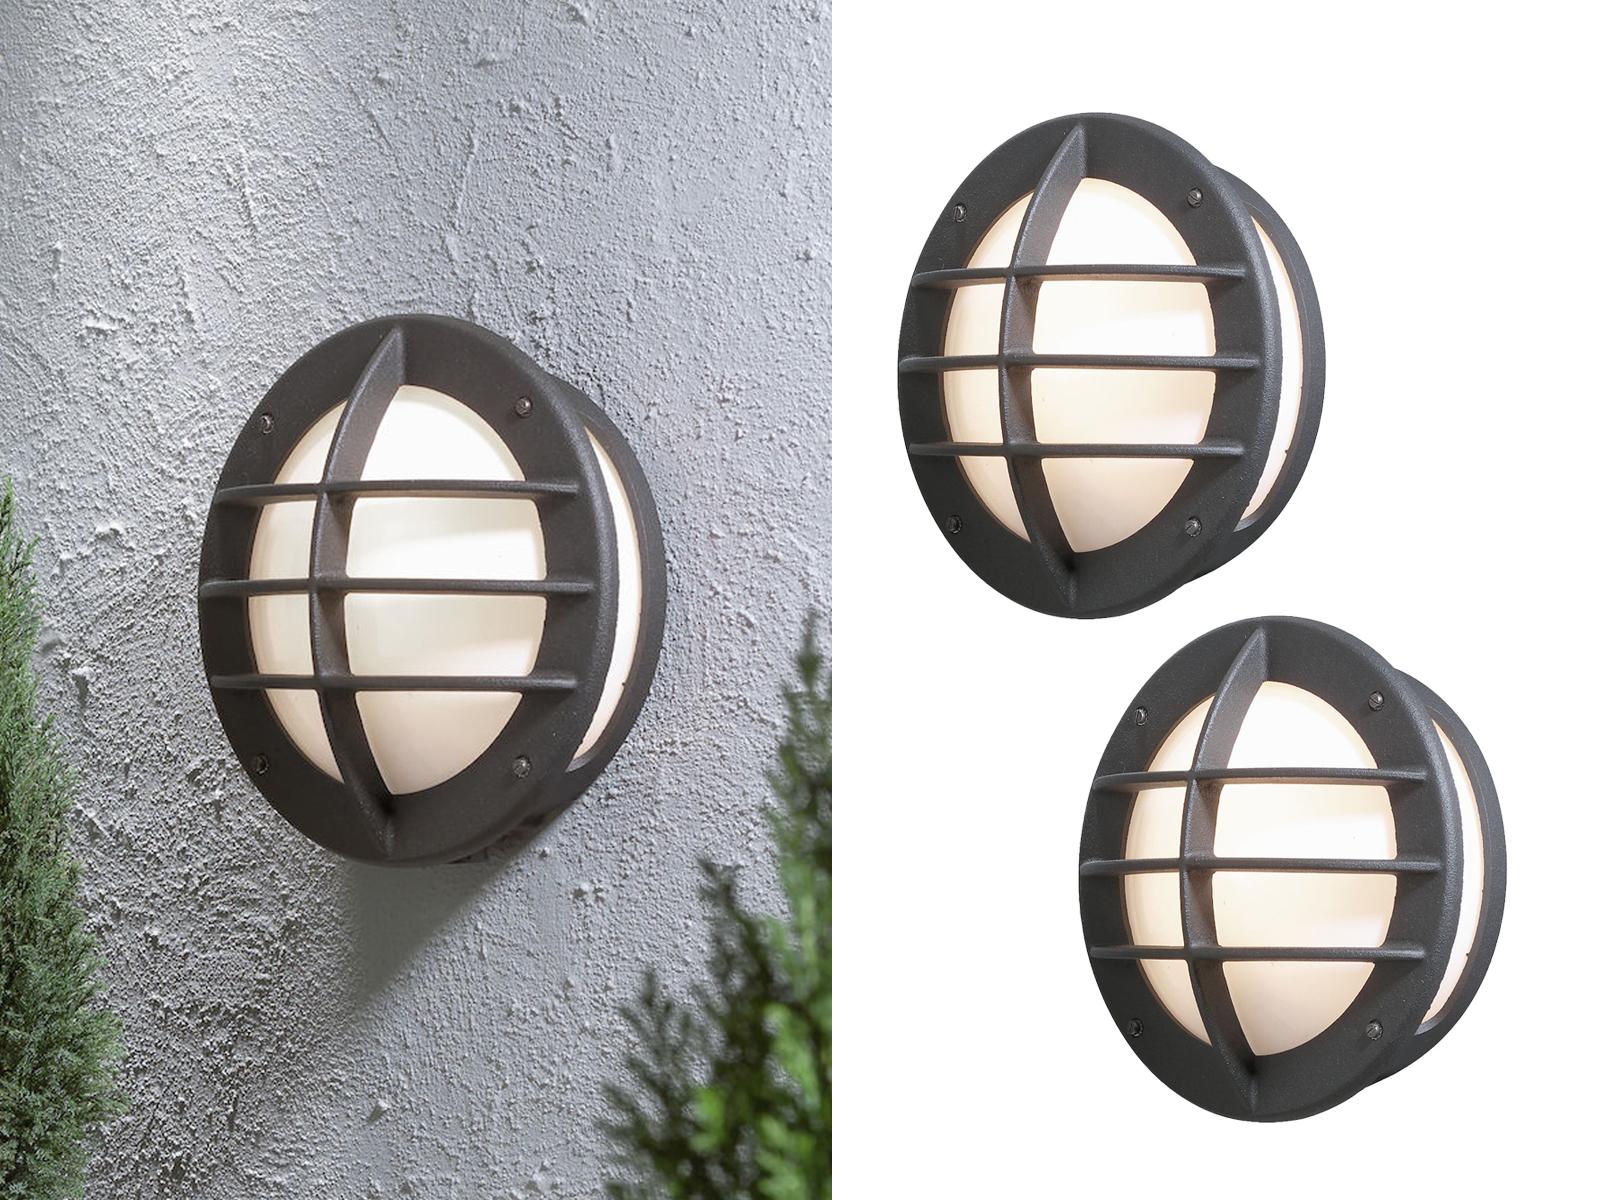 Konstsmide Außenwandleuchte 31cm Wandlampe schwarz Beleuchtung Haus Terrasse